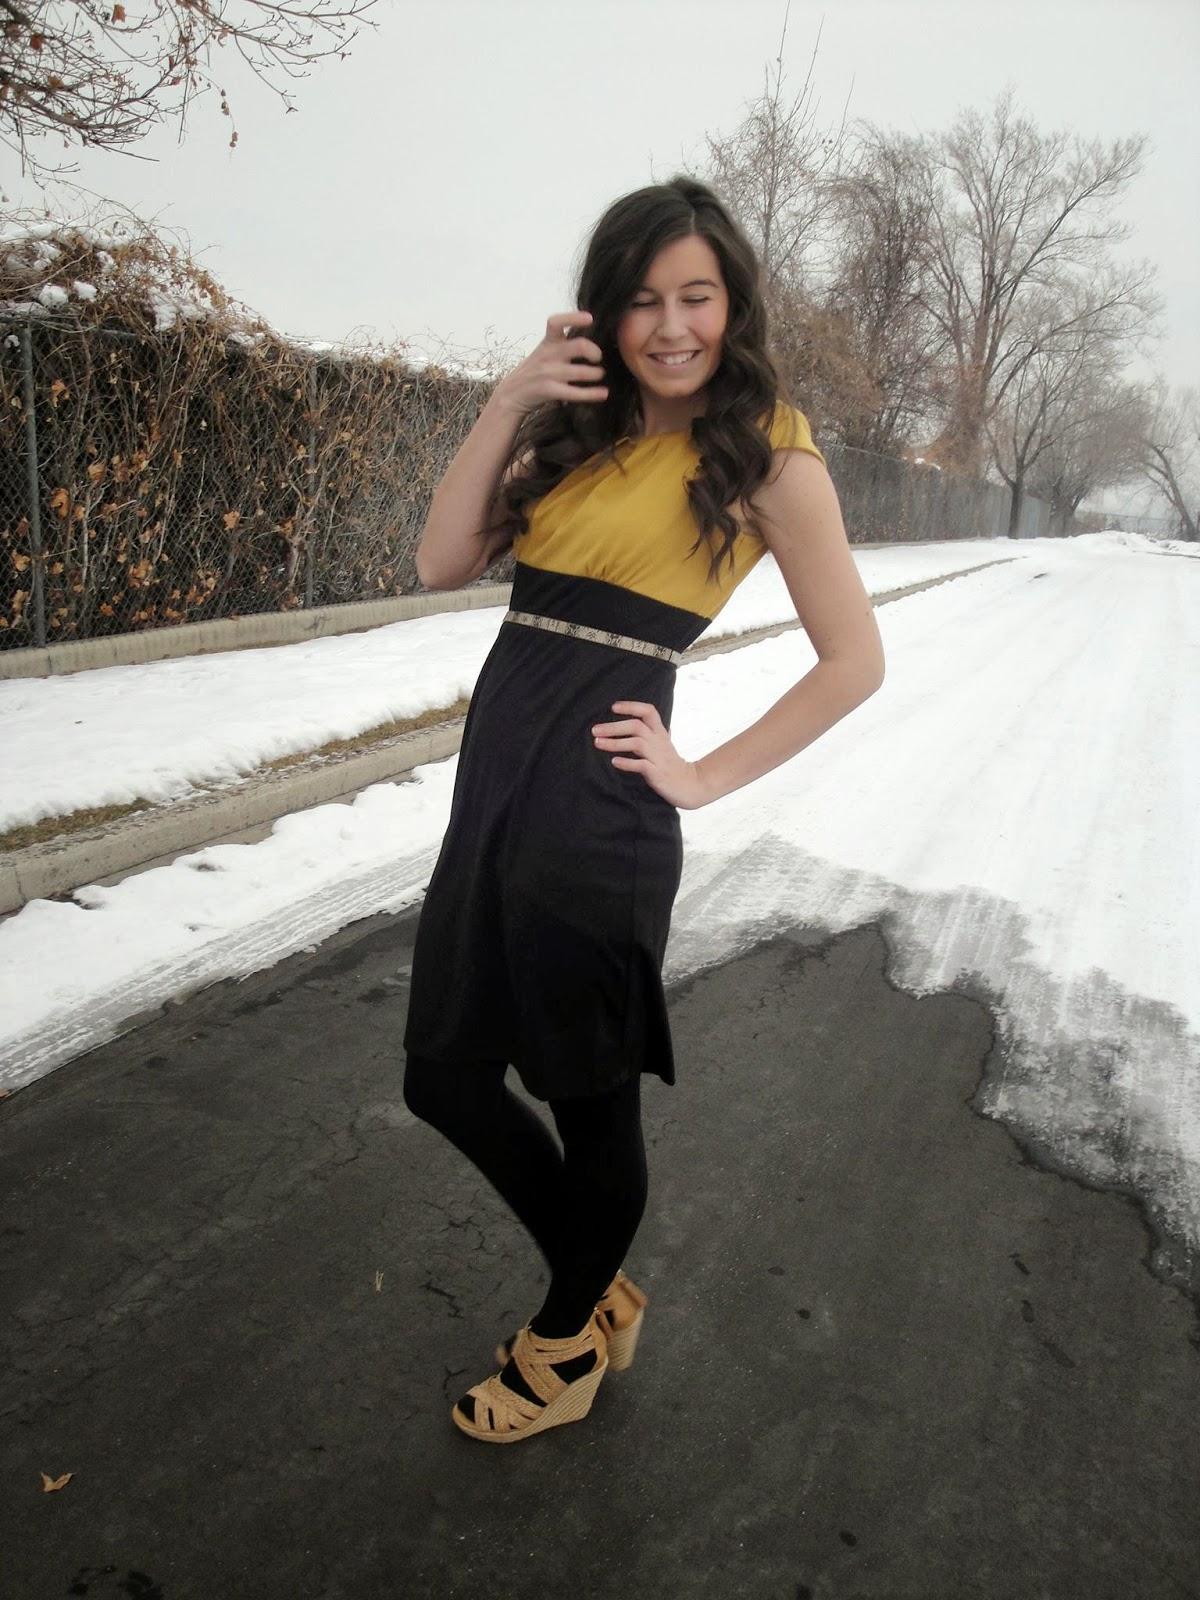 jcpenneys, helene blake, cap sleeve dress, jcpenneys dress, dressy, professional, pretty, dressy, long hair, curly hair,